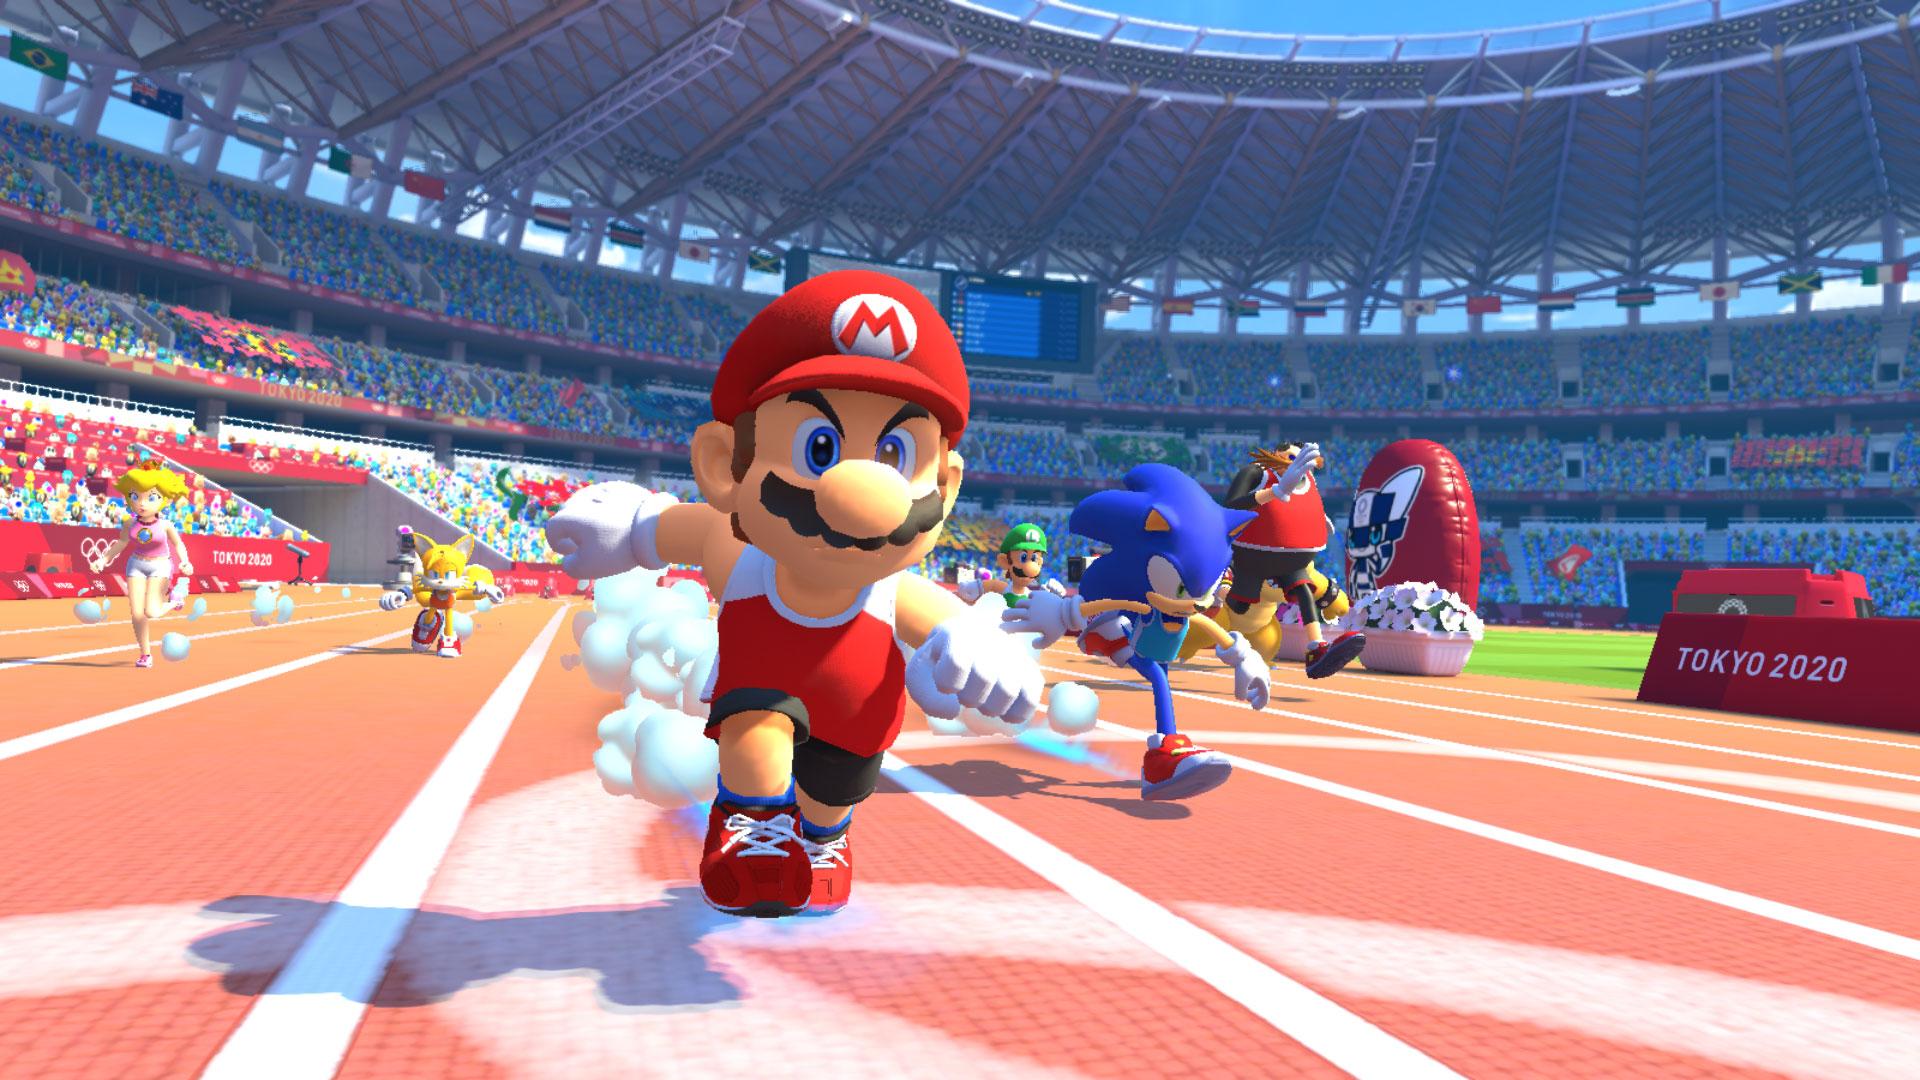 Mario And Sonic At The Tokyo 2020 Olympic Games Screenshot 1